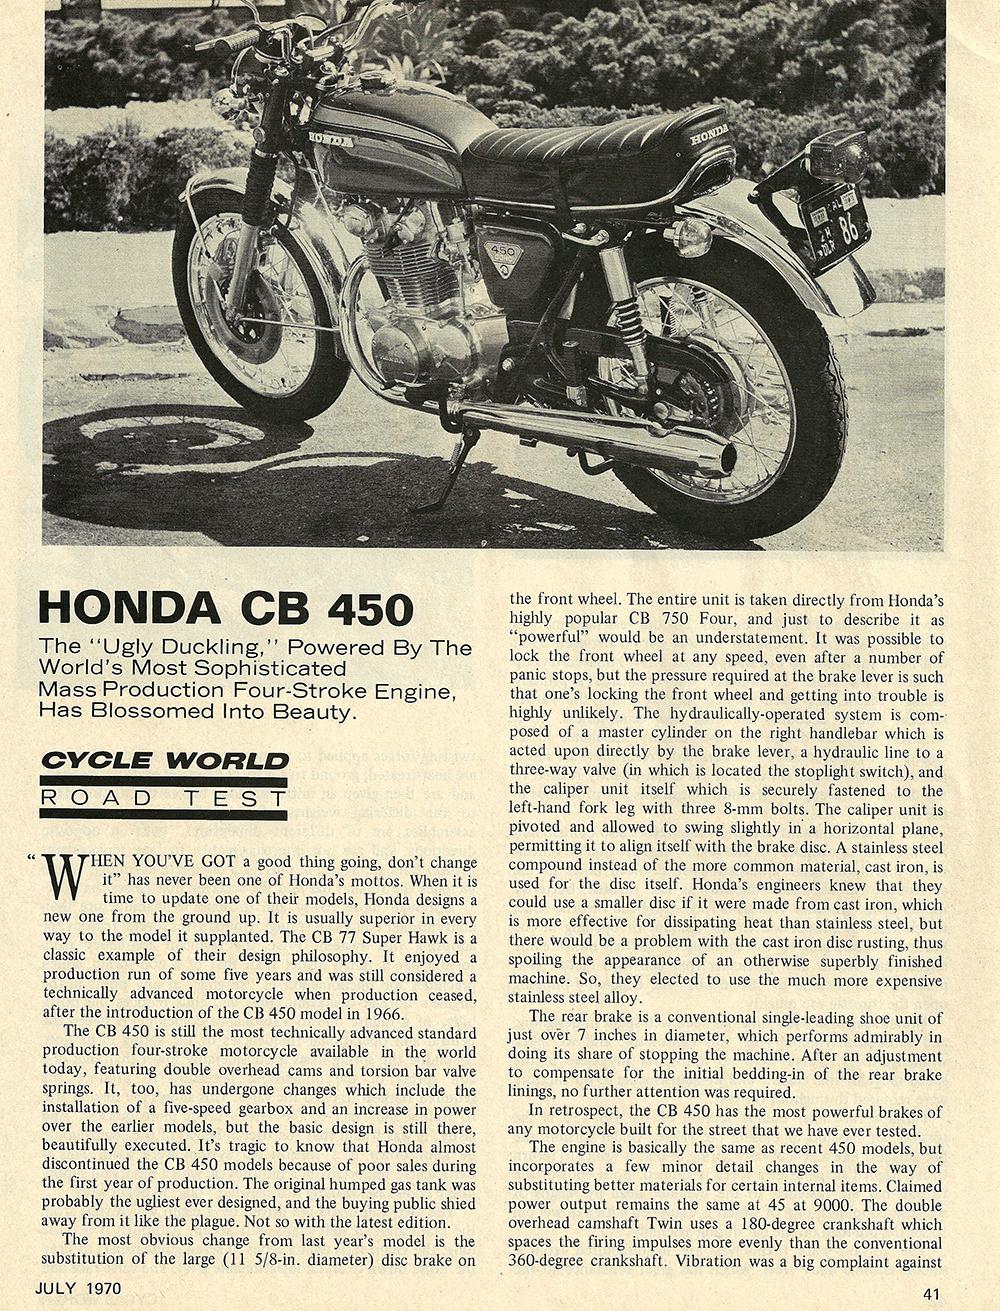 1970 Honda CB450 road test 01.jpg